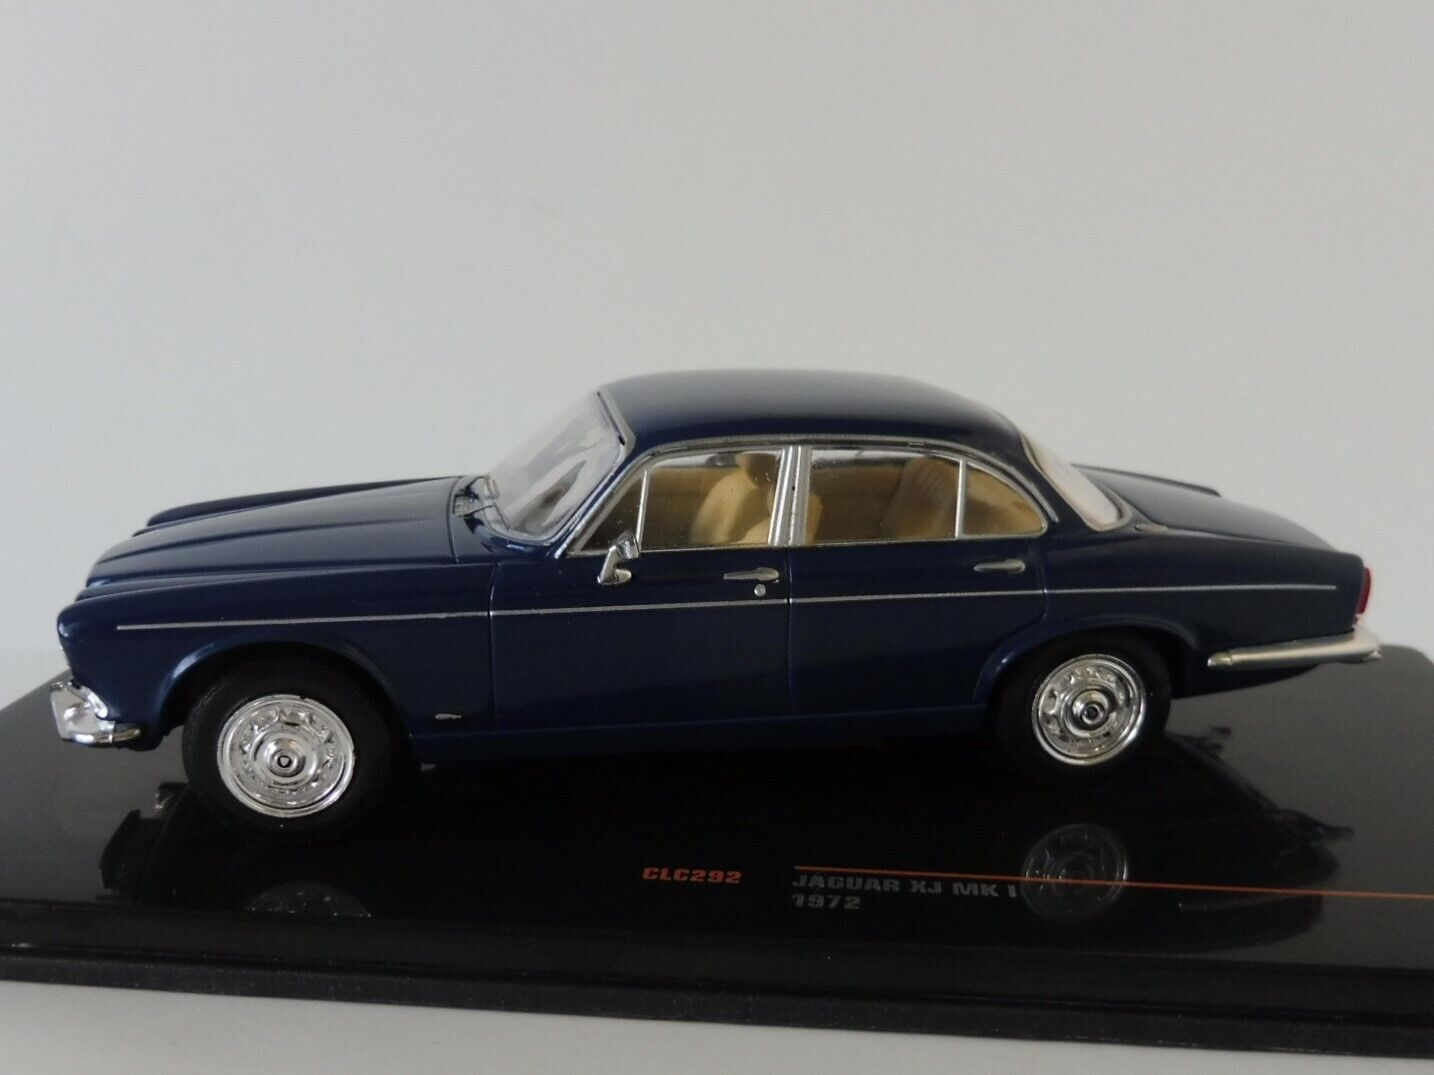 salida Jaguar XJ Mk.i 1972 1 43 Ixo CLC292 Serie Serie Serie i Azul  wholesape barato